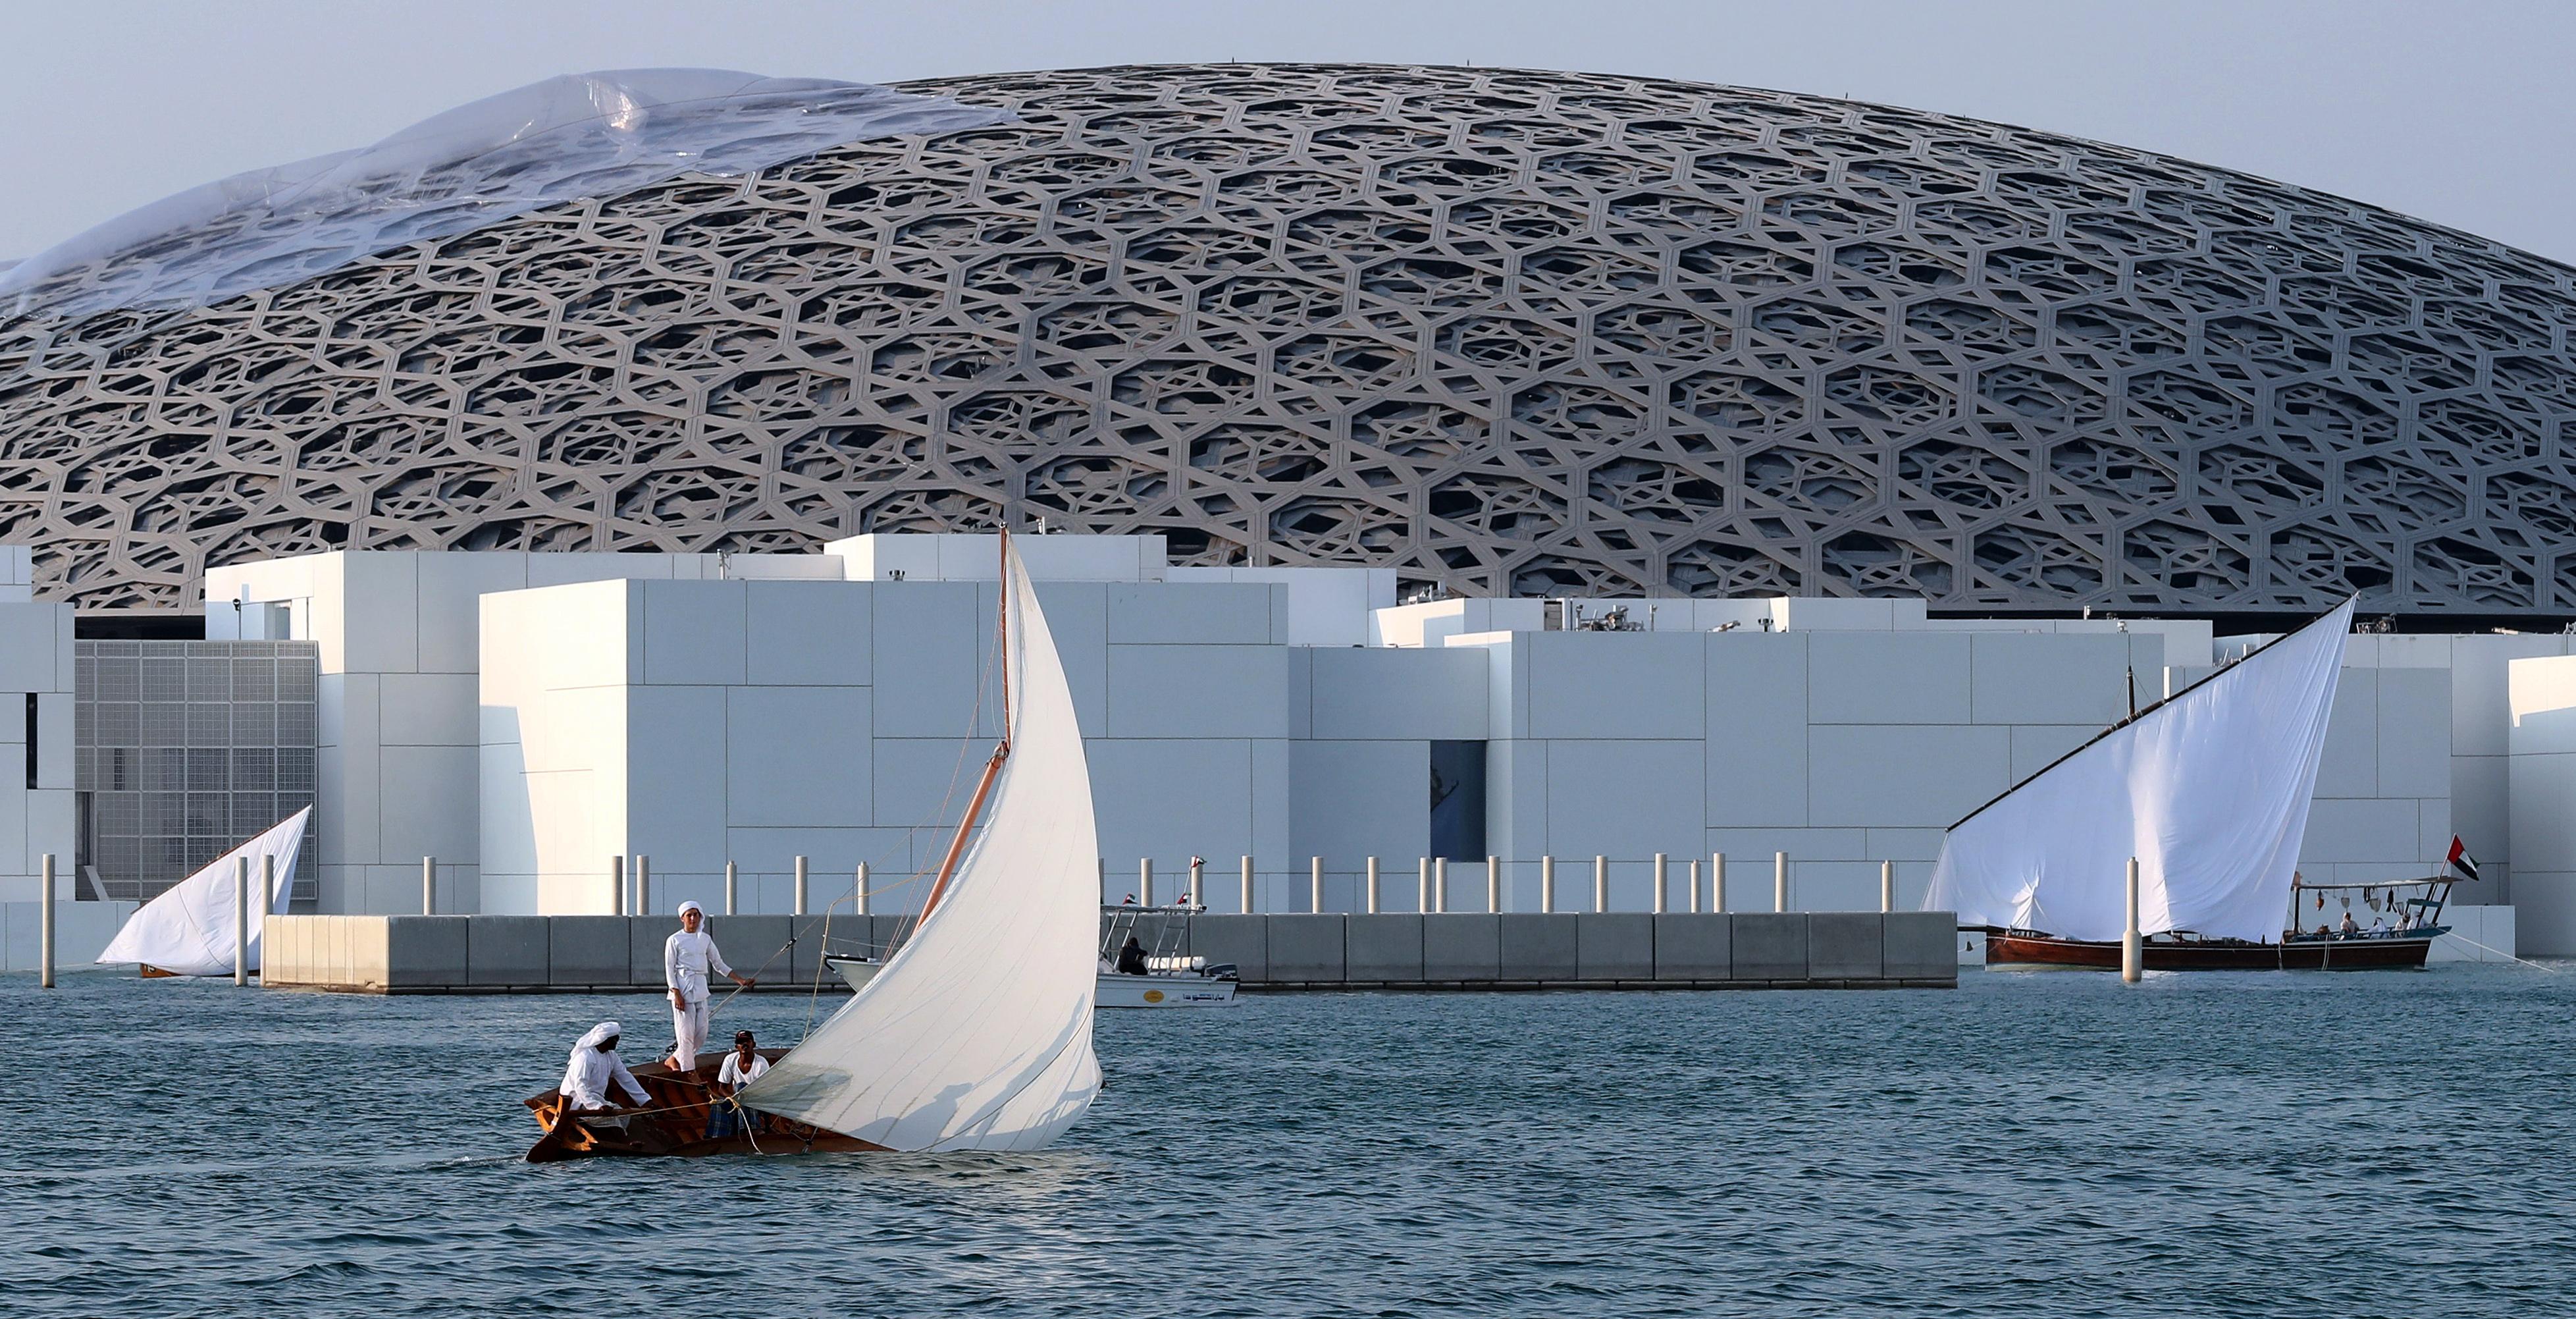 Louvre Abu Dhabi set to reveal Da Vinci's 'Salvator Mundi' in